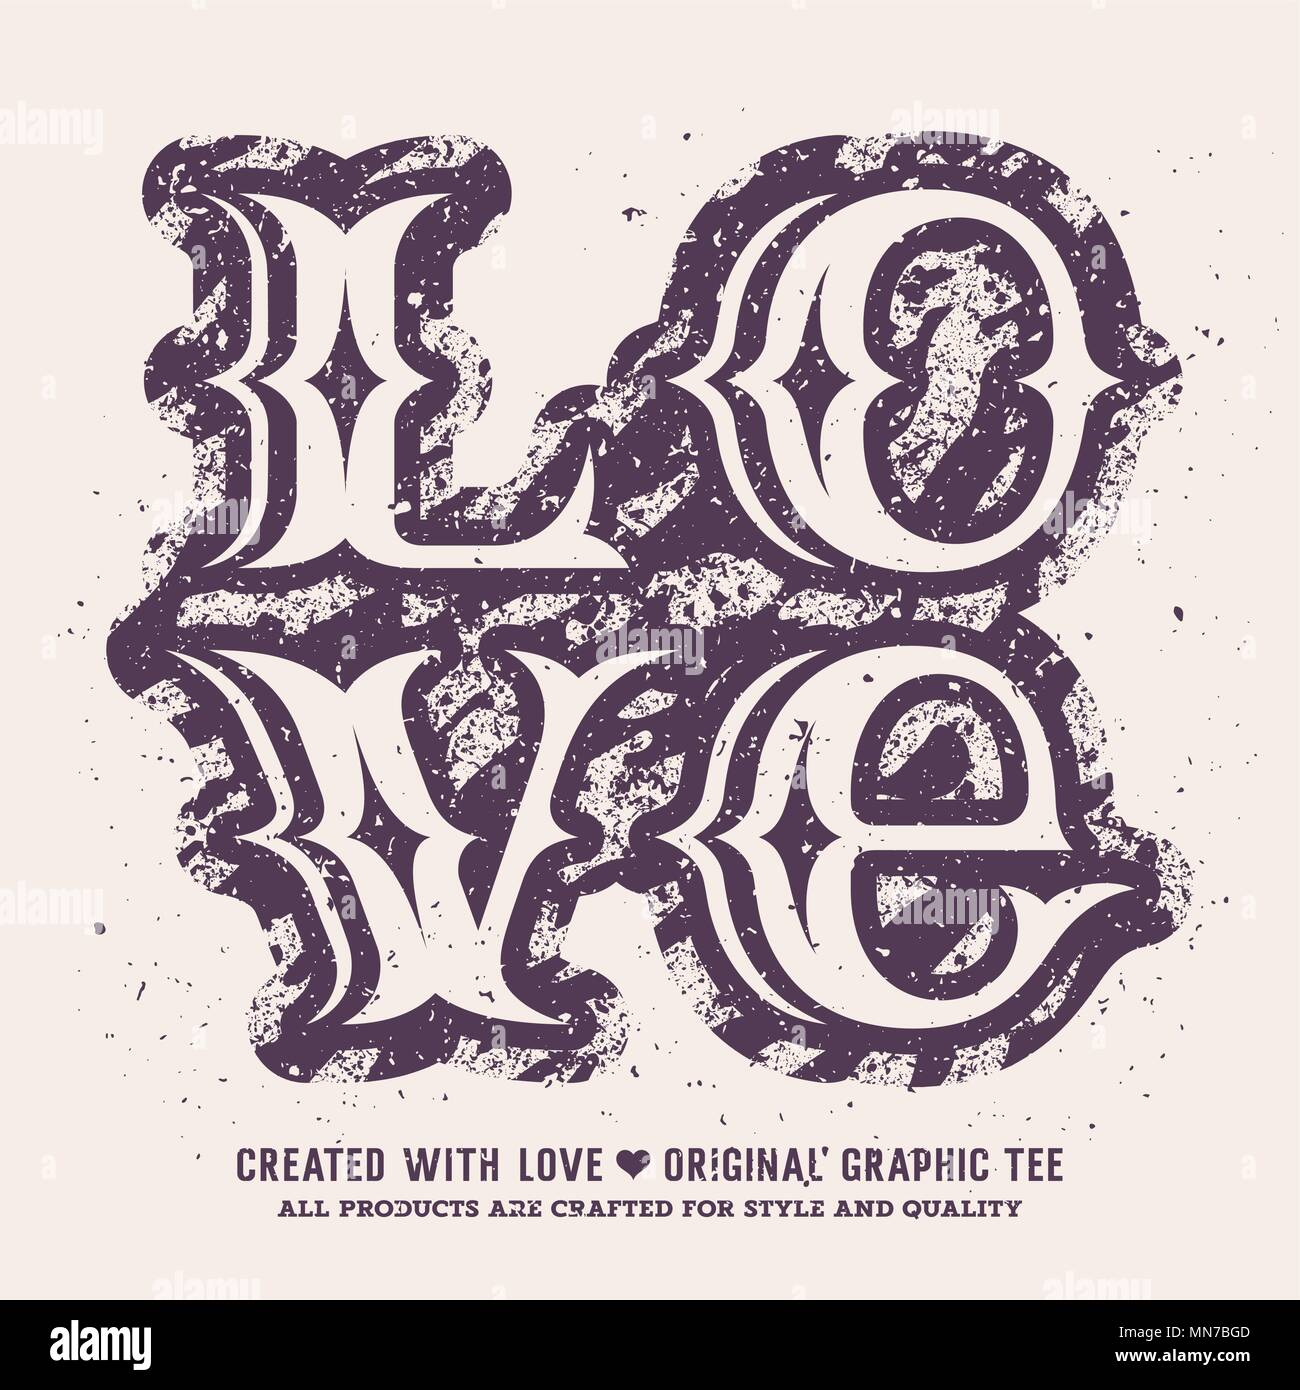 Love lettering. Valentines day romantic vector illustration. T-shirt apparel print graphics. Original graphic Tee - Stock Image